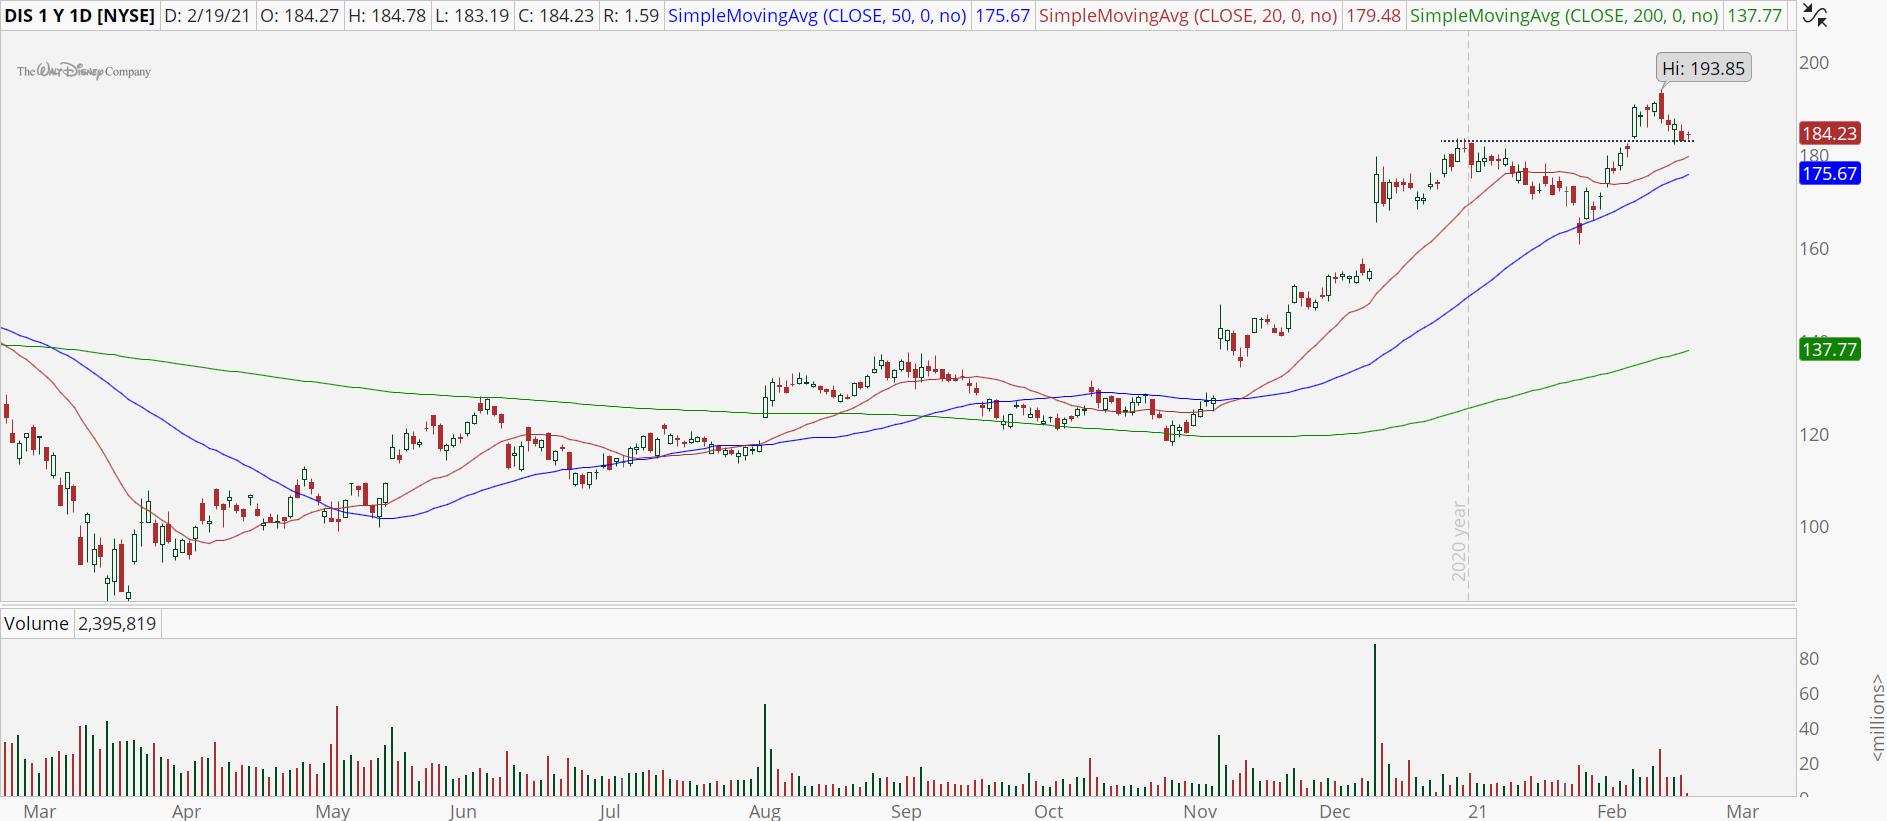 Walt Disney Co (DIS) stock with bull retracement